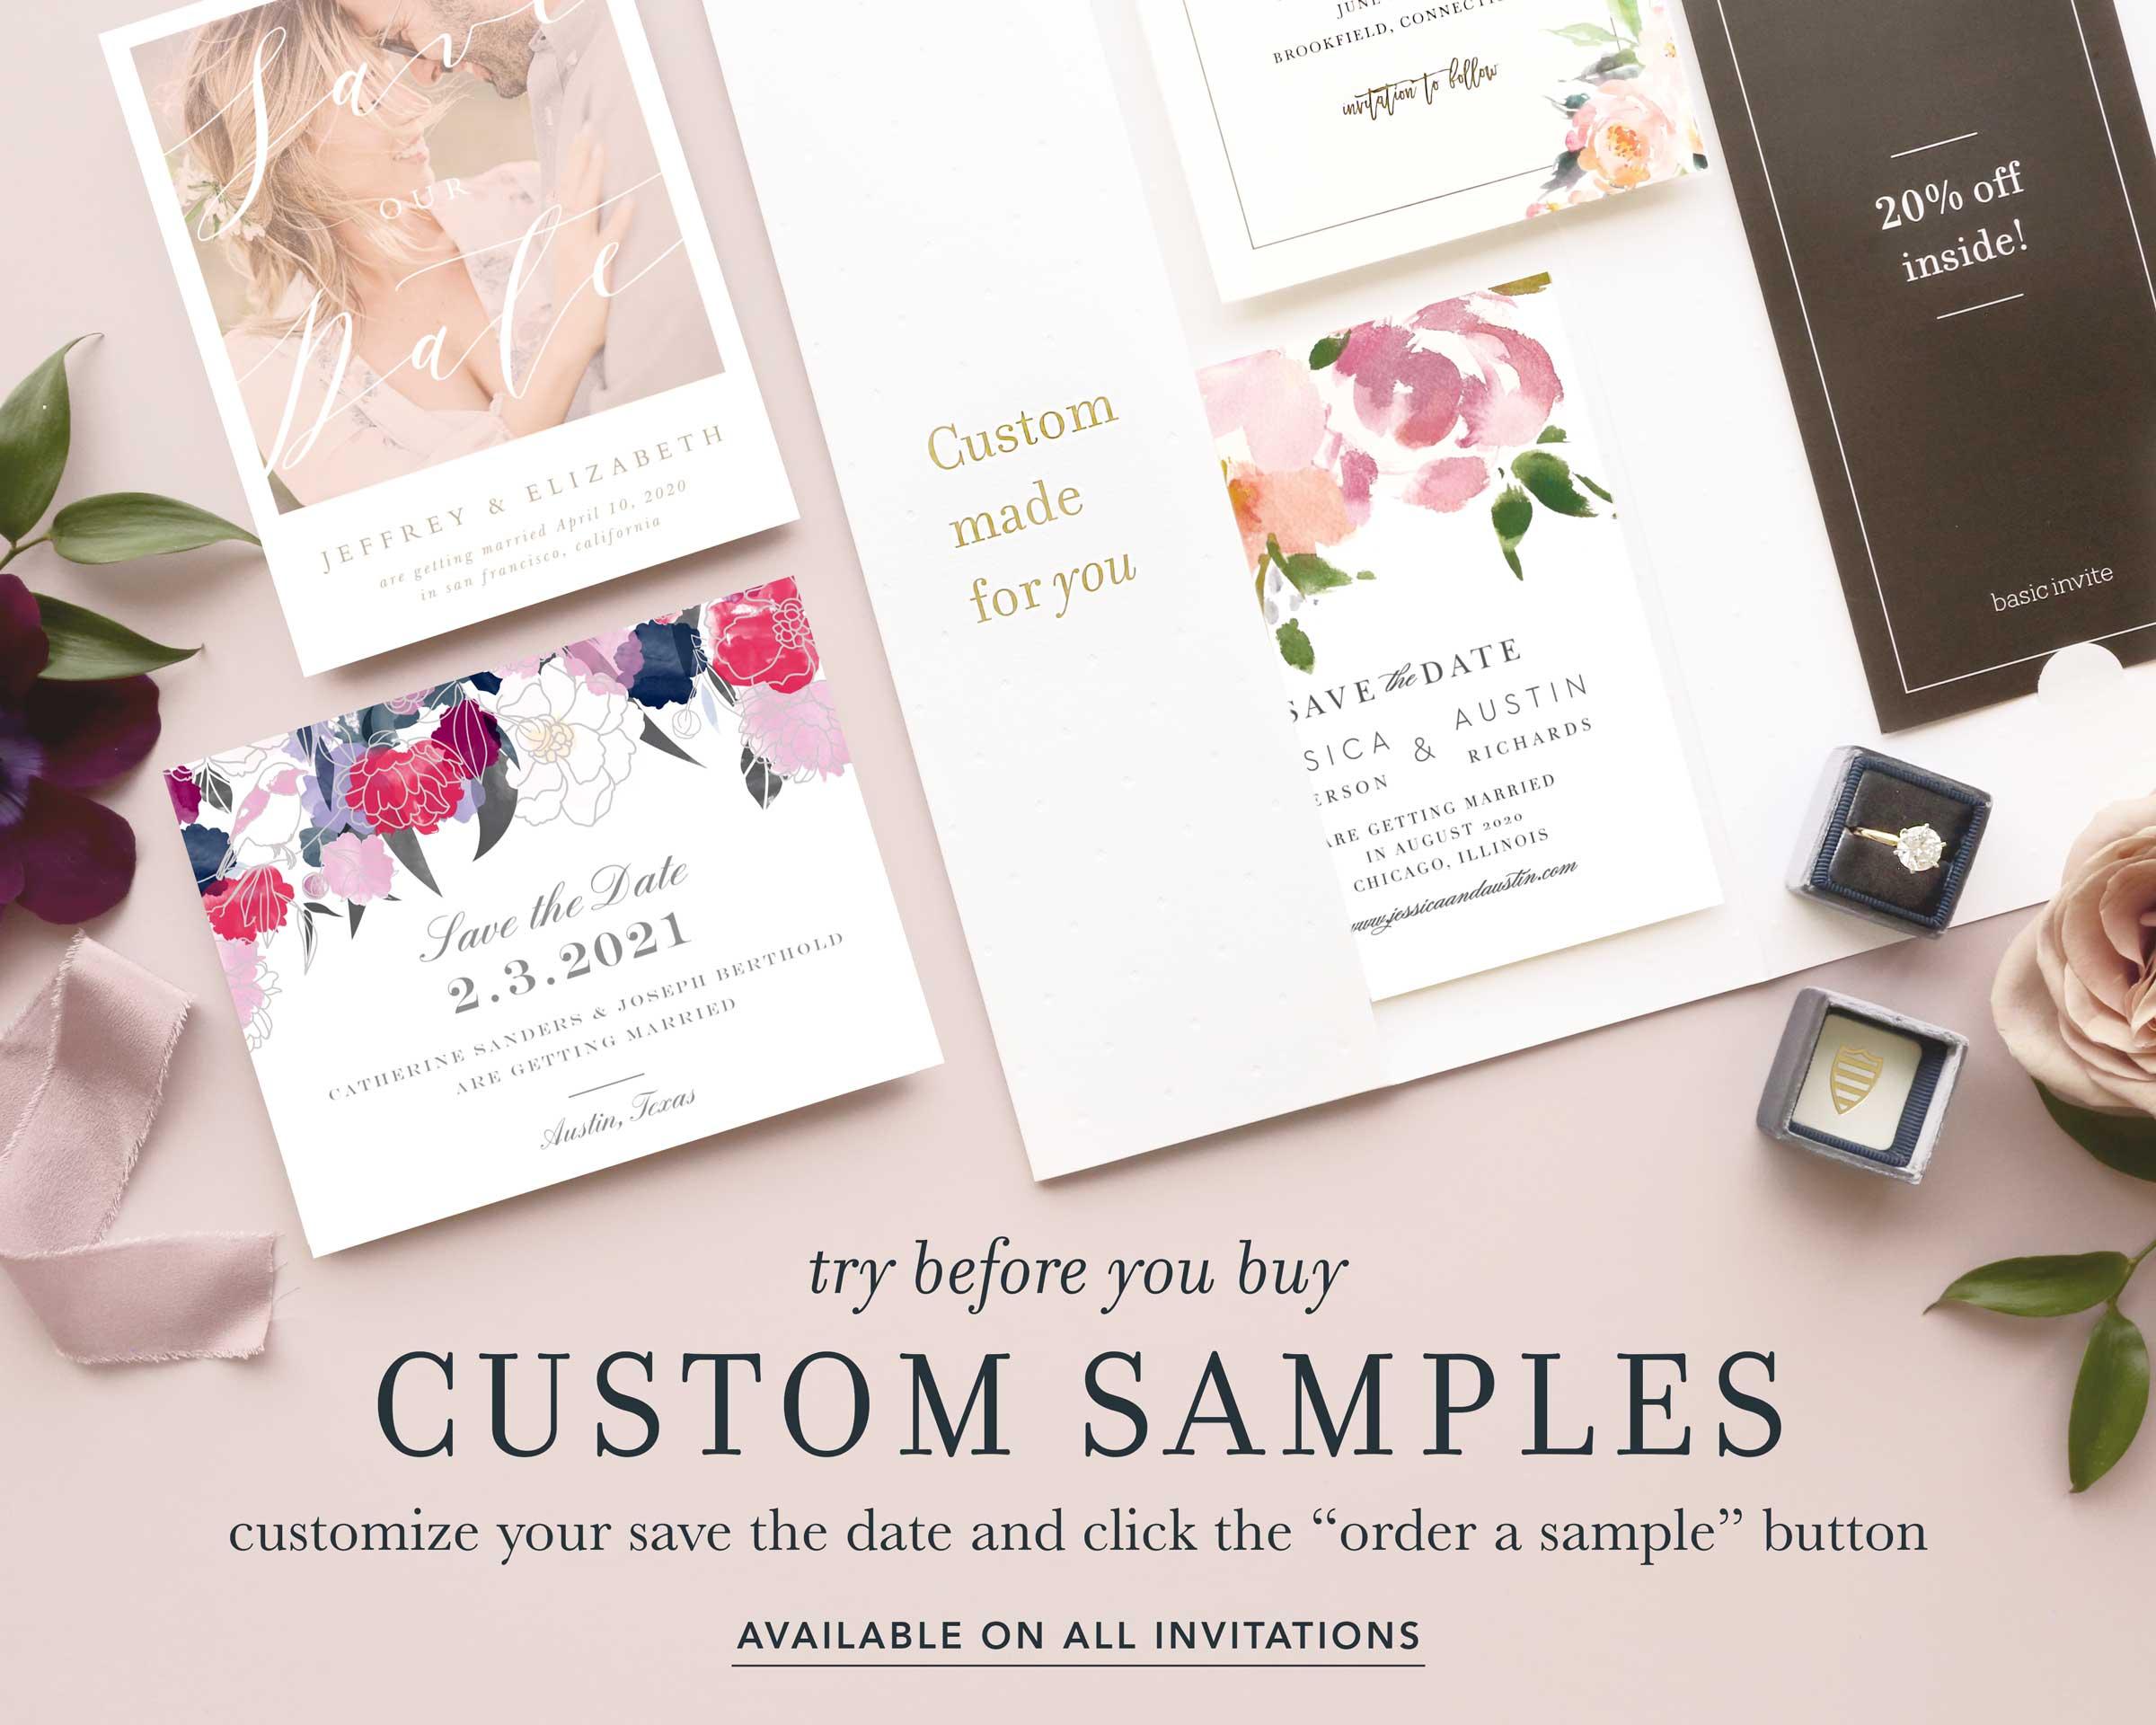 Try before you buy custom samples.